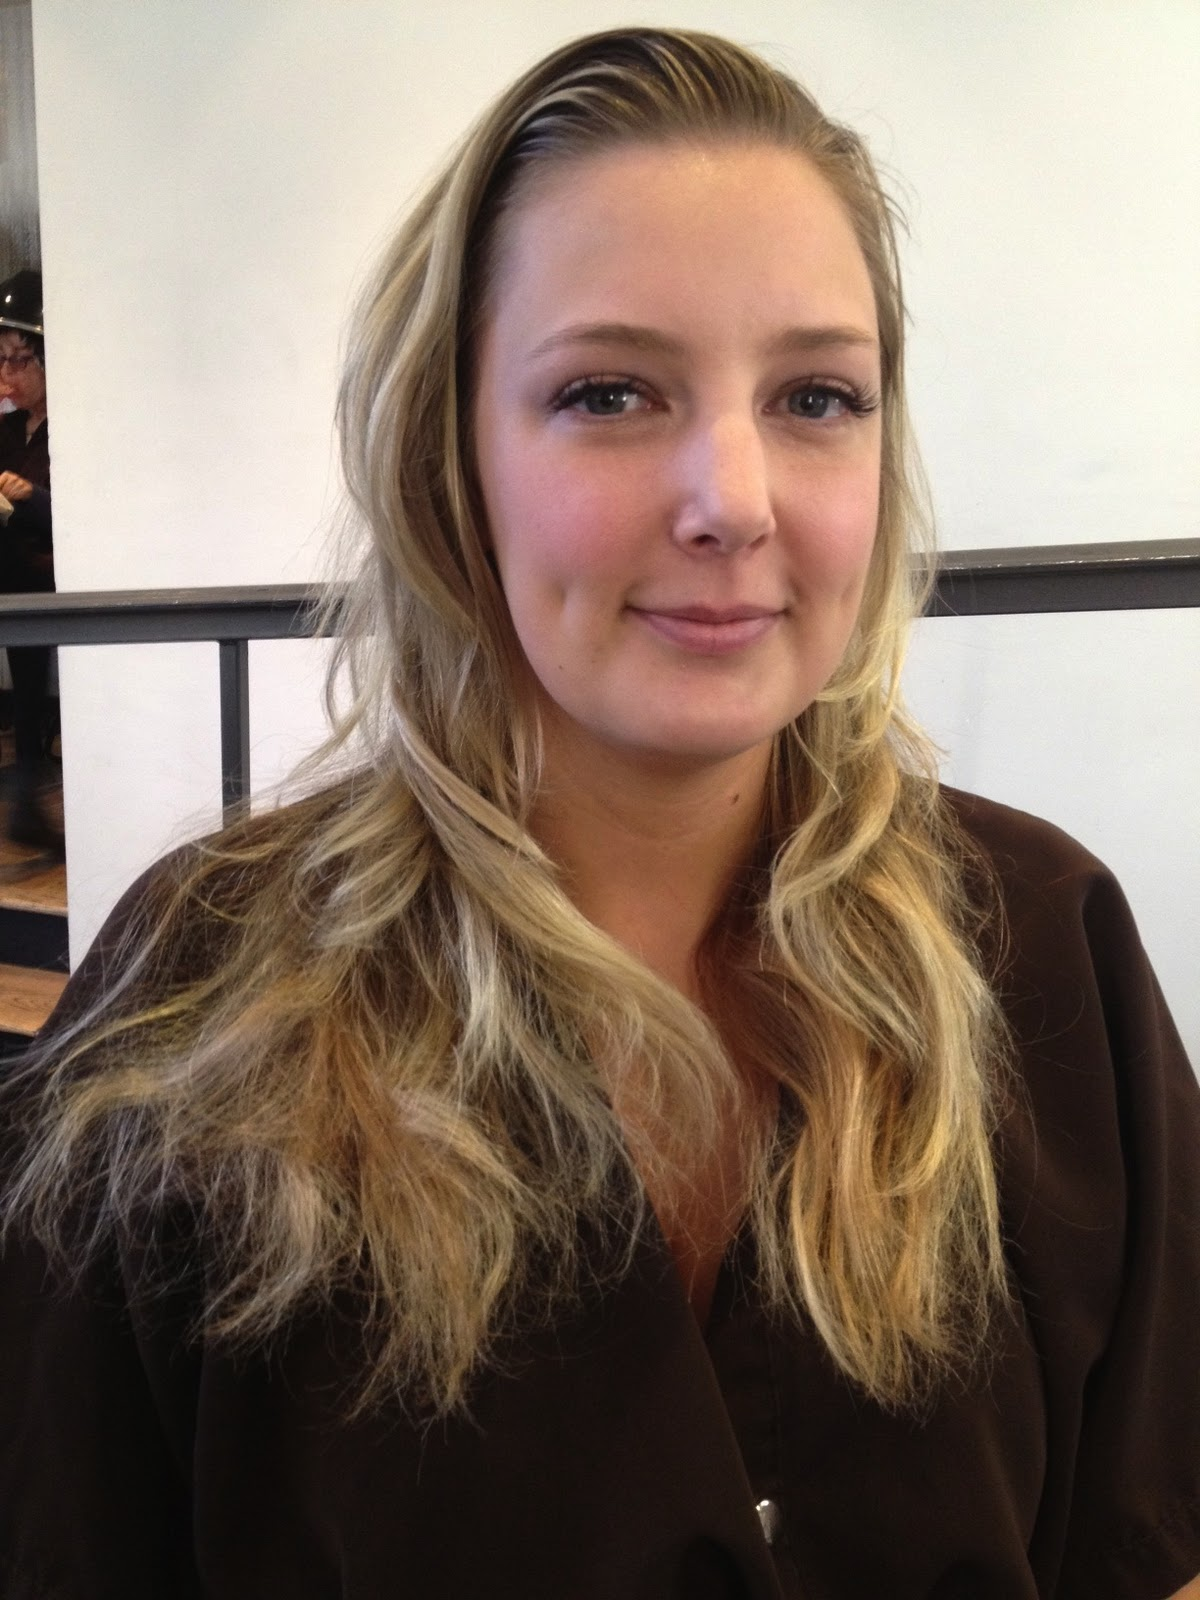 Hair Cutting New Style : Veras New Hair Cut & Style! -